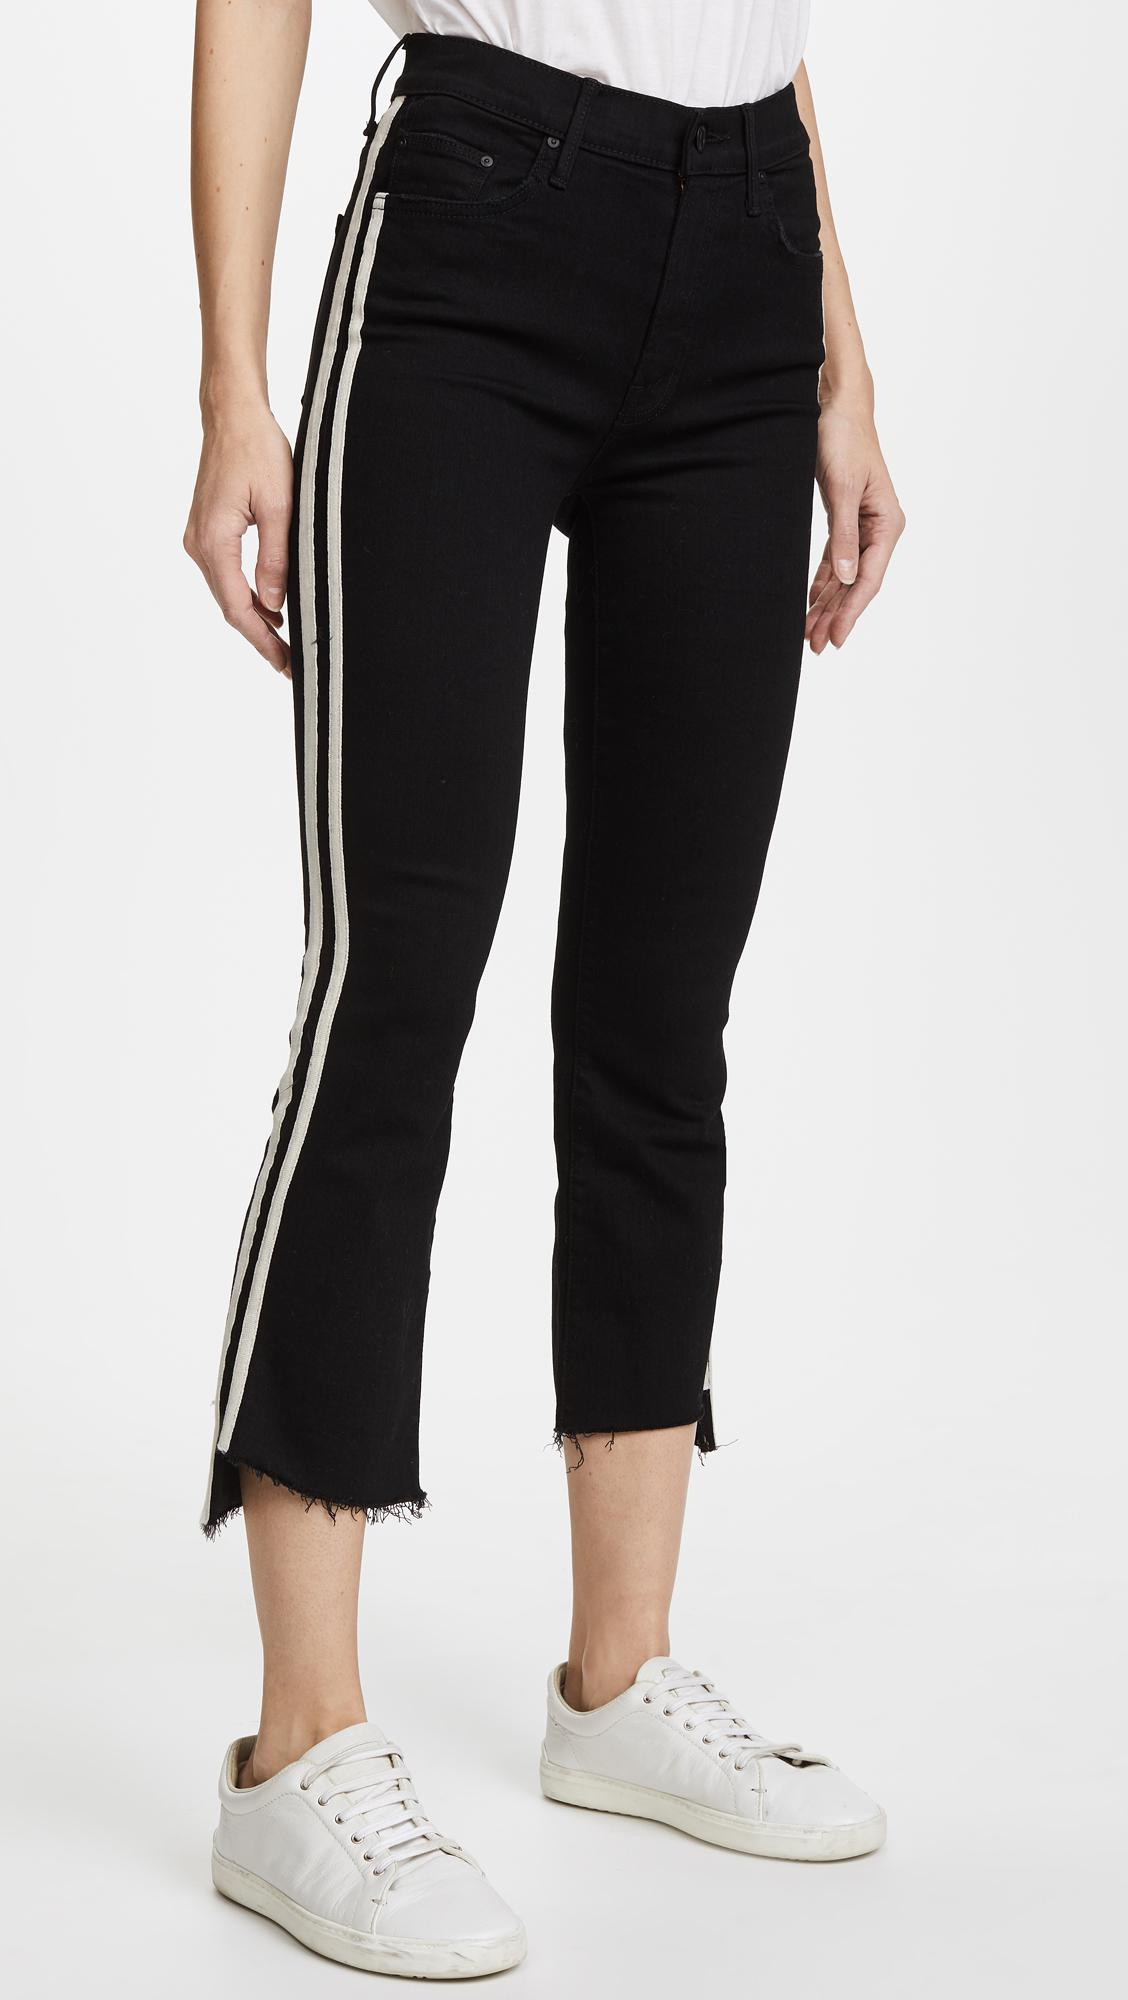 Mother Denim Insider Crop Step Fray Jeans, Not Guilty In -8756